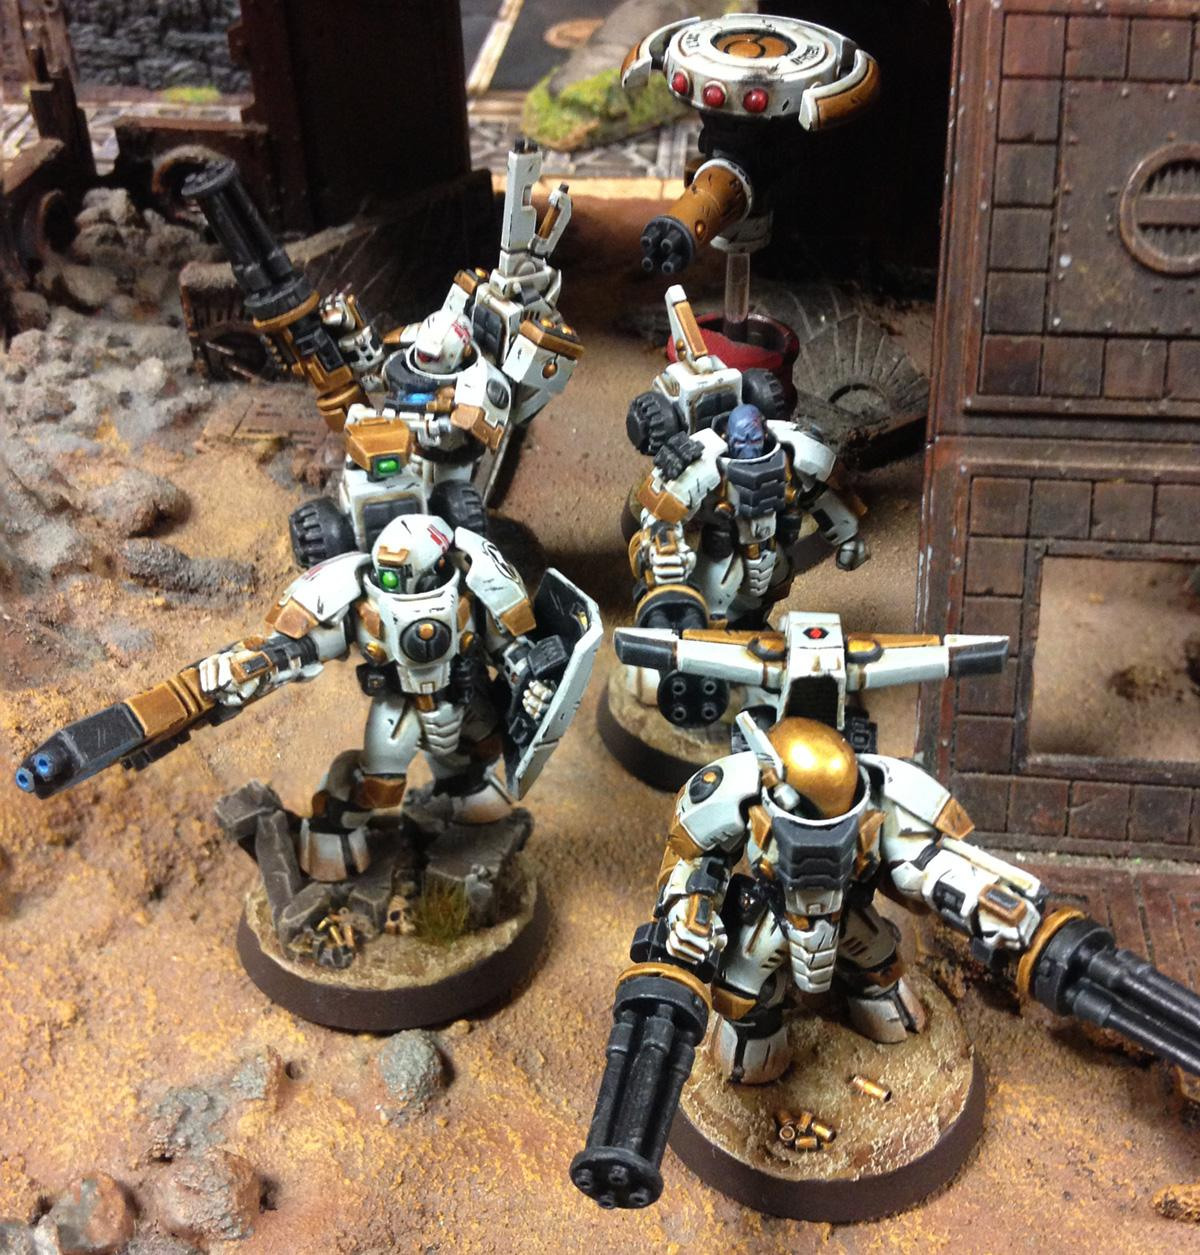 Conversion, Kill Team, Tau, Tau Empire, Warhammer 40,000